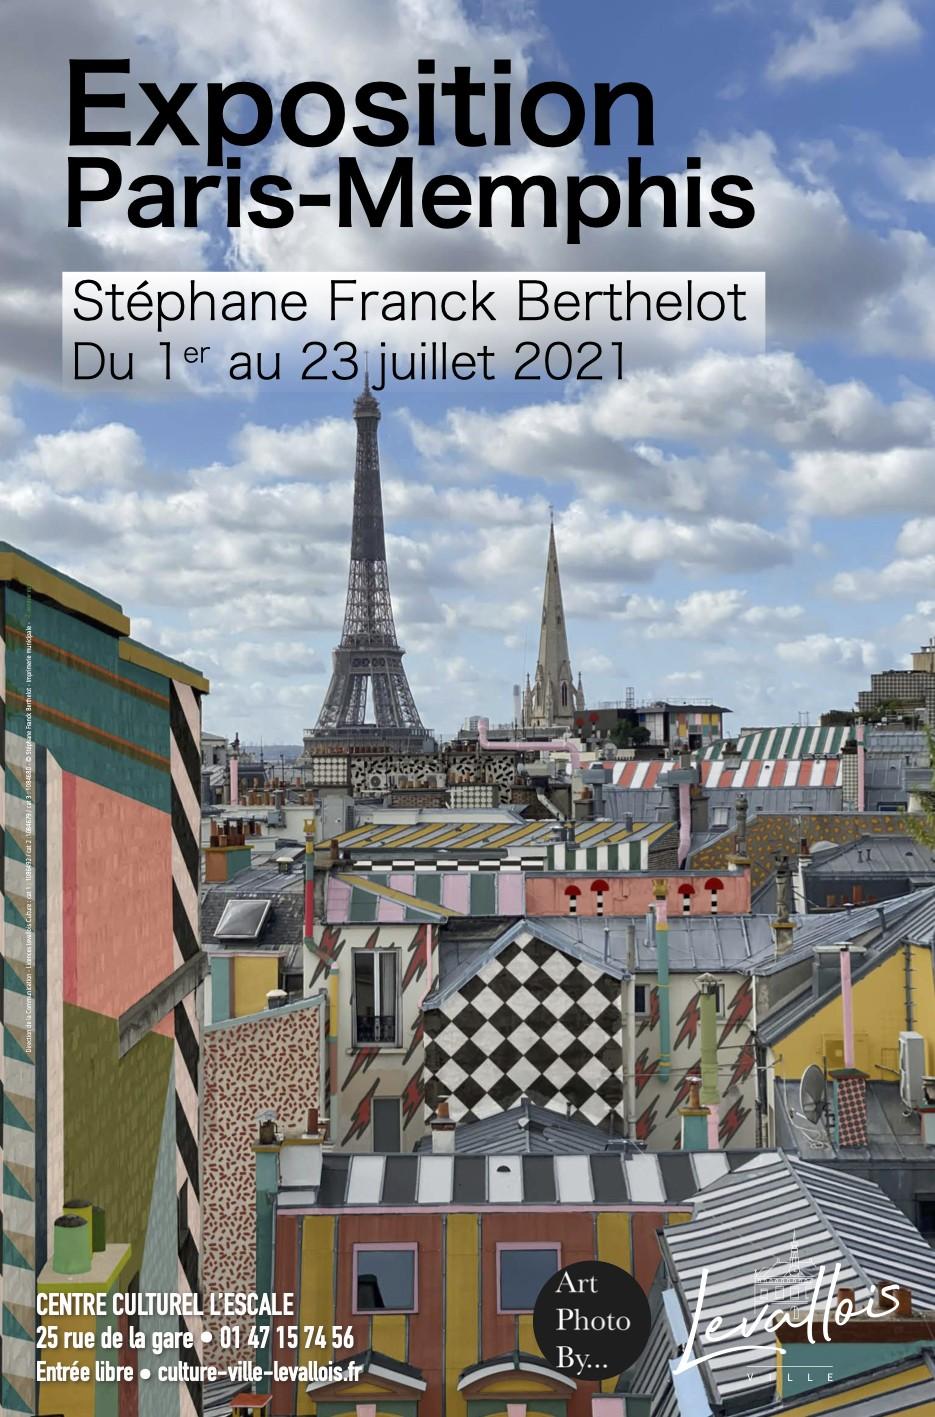 STEPHANE FRANCK BERTHELOT